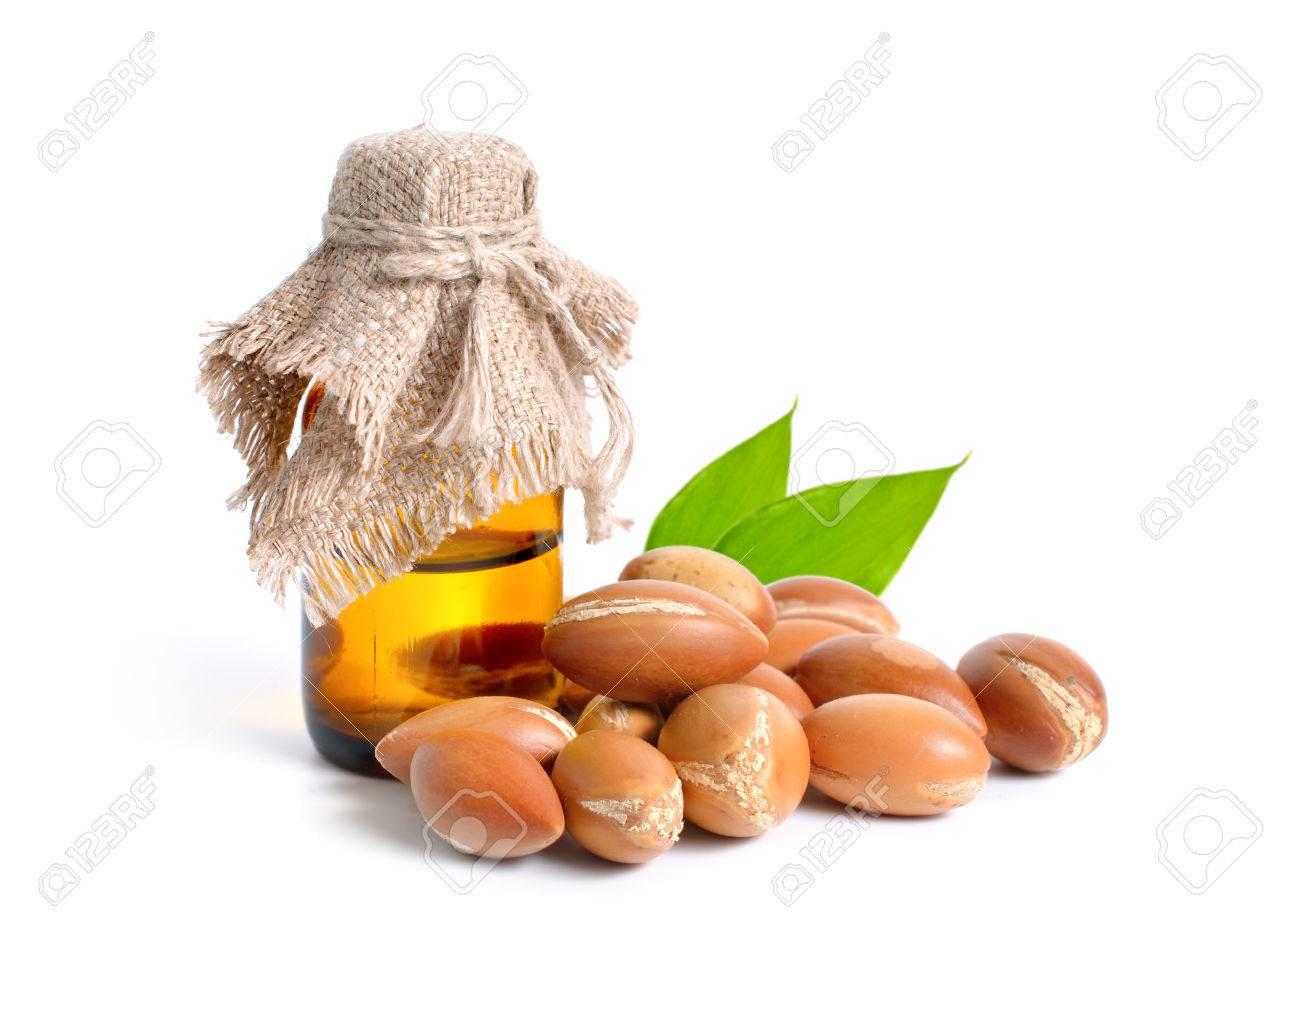 Argan seed with pharmaceutical bottle. Isolated on white background. - 77209739